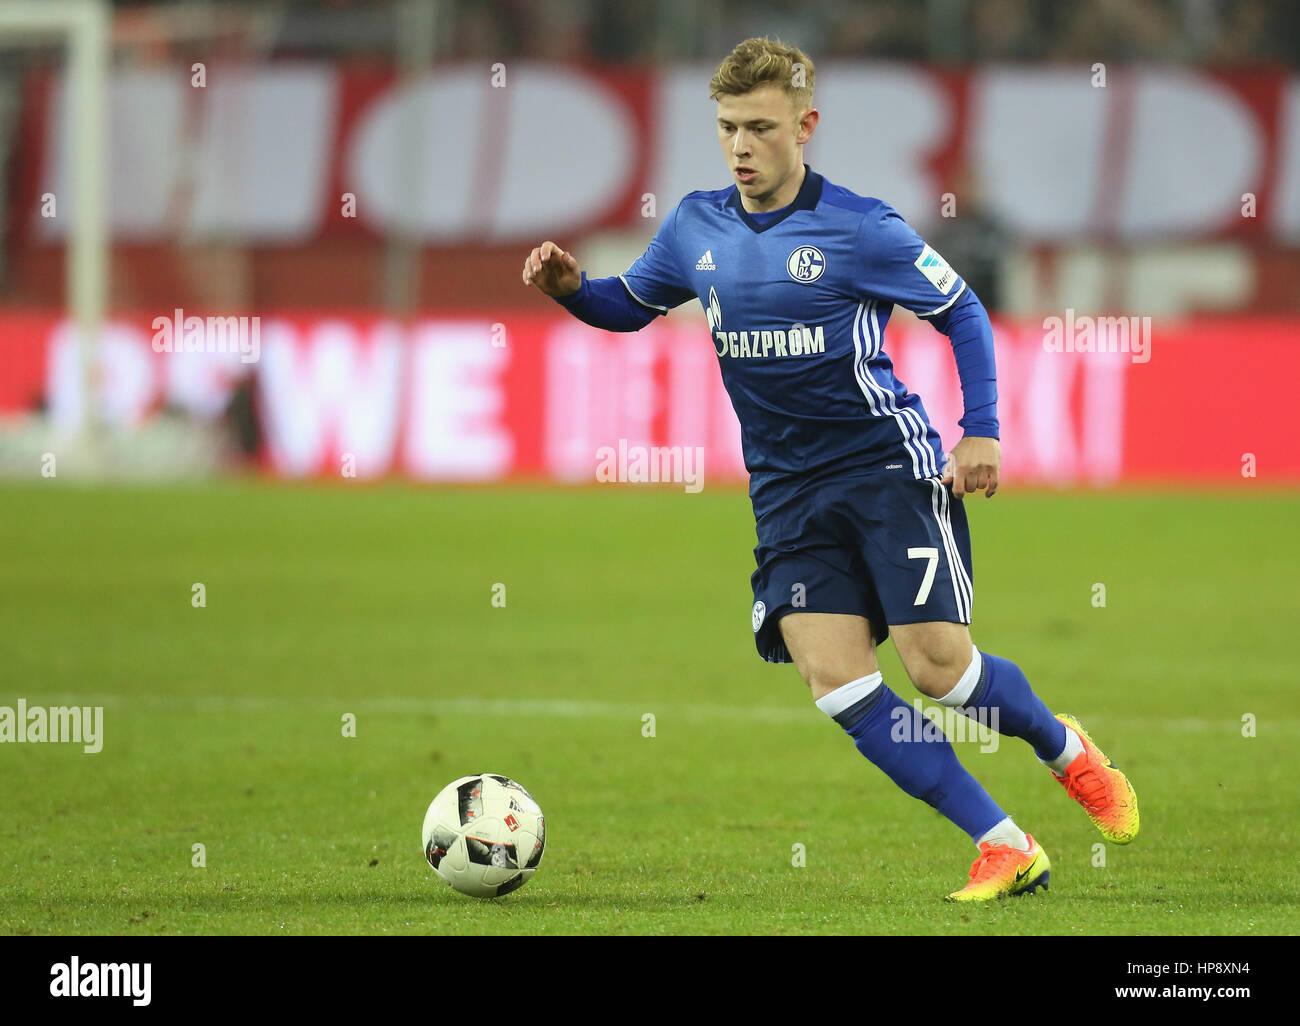 Cologne, Germany, February 19, 2017, Bundesliga matchday 21, 1. FC Koeln - FC Schalke 04:  Max Meyer (Schalke) controls - Stock Image